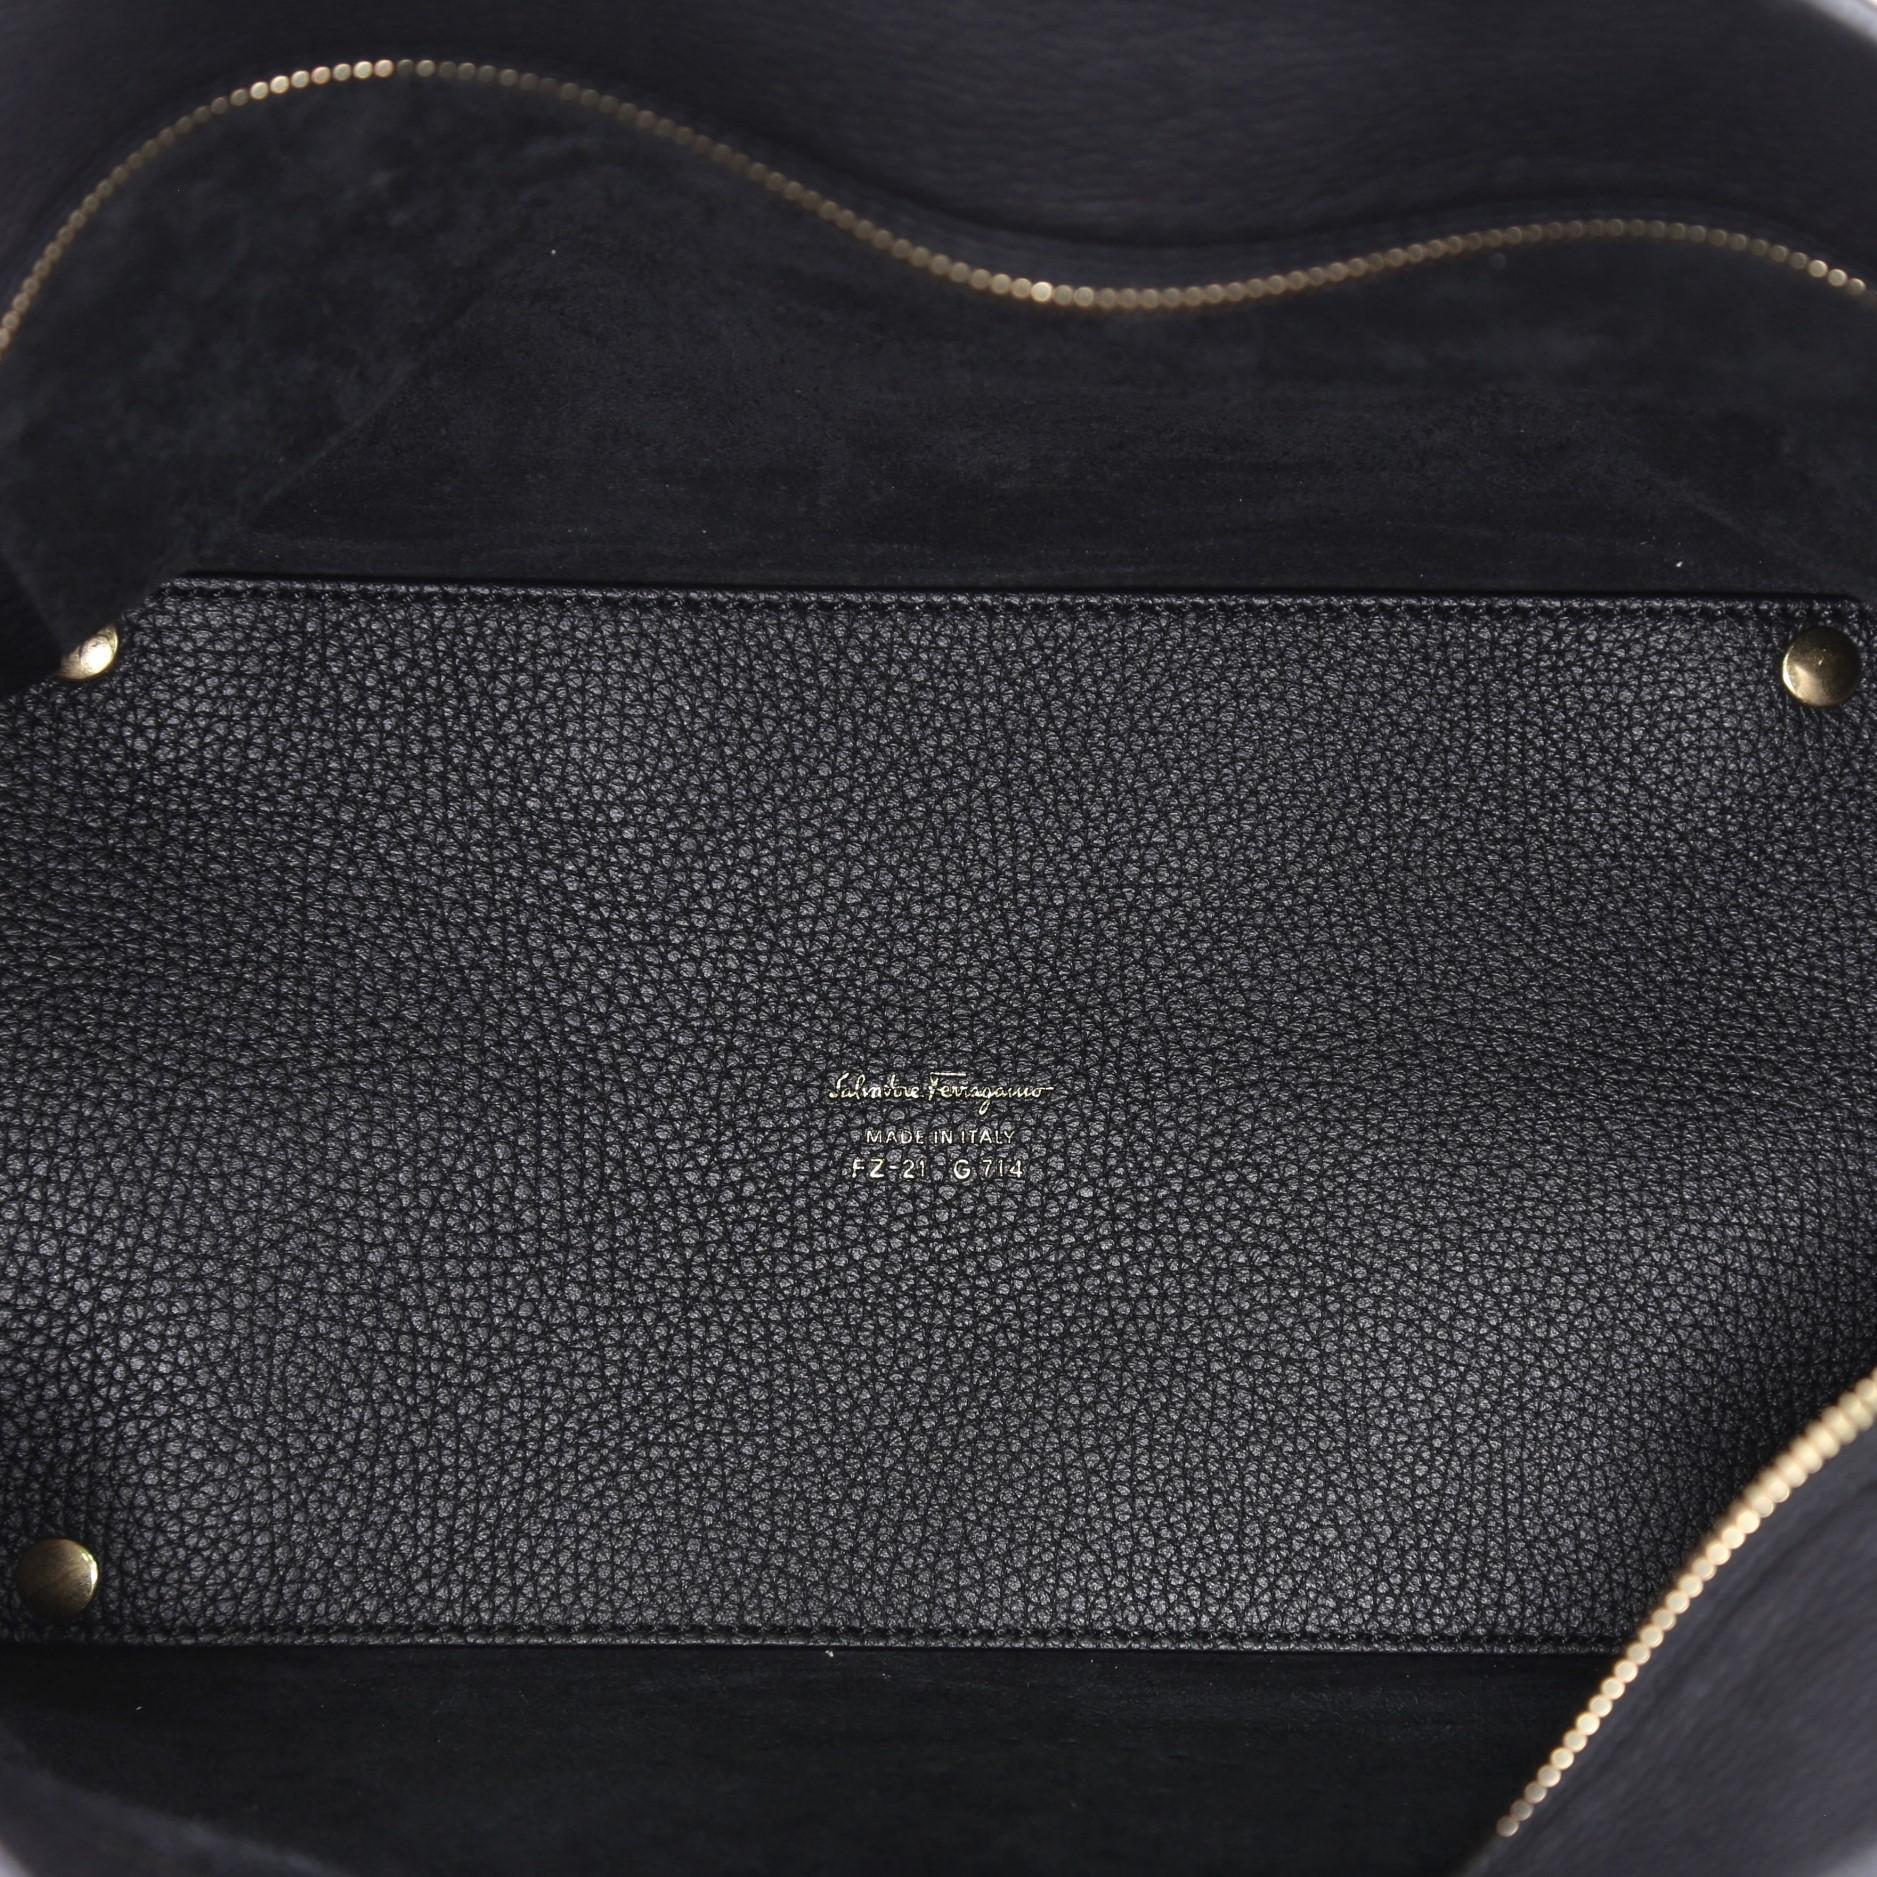 16a369065e Salvatore Ferragamo Marta Tote Perforated Leather Medium at 1stdibs